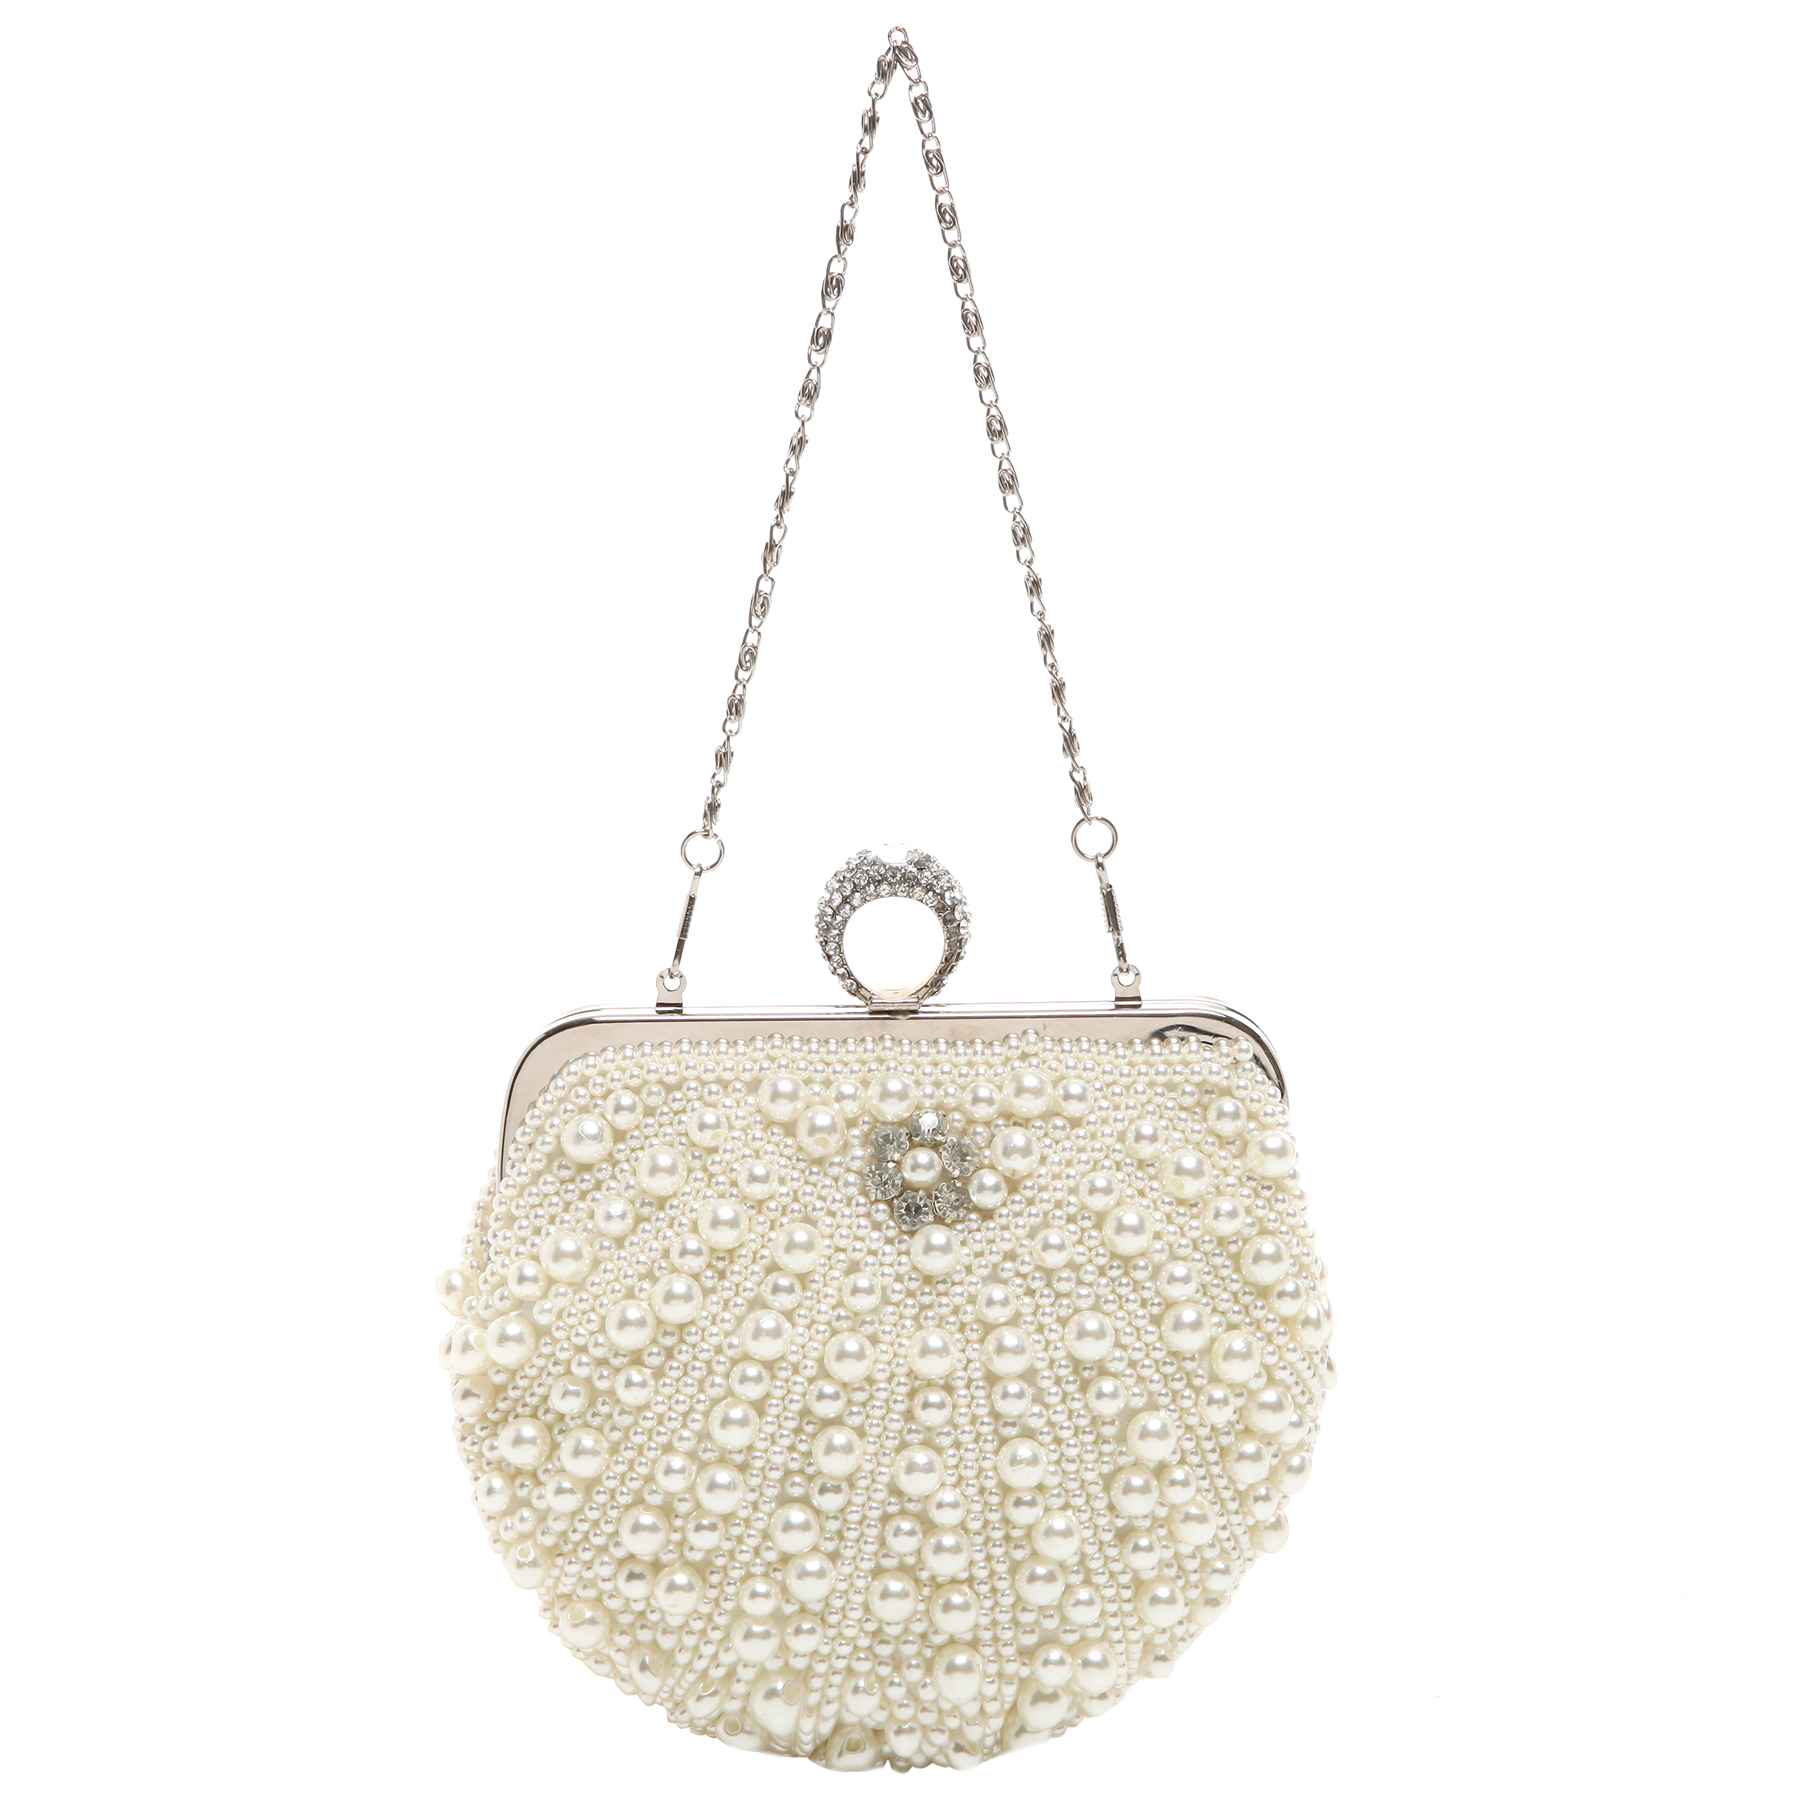 TIANA White Pearl Rhinestone Evening Bag short strap